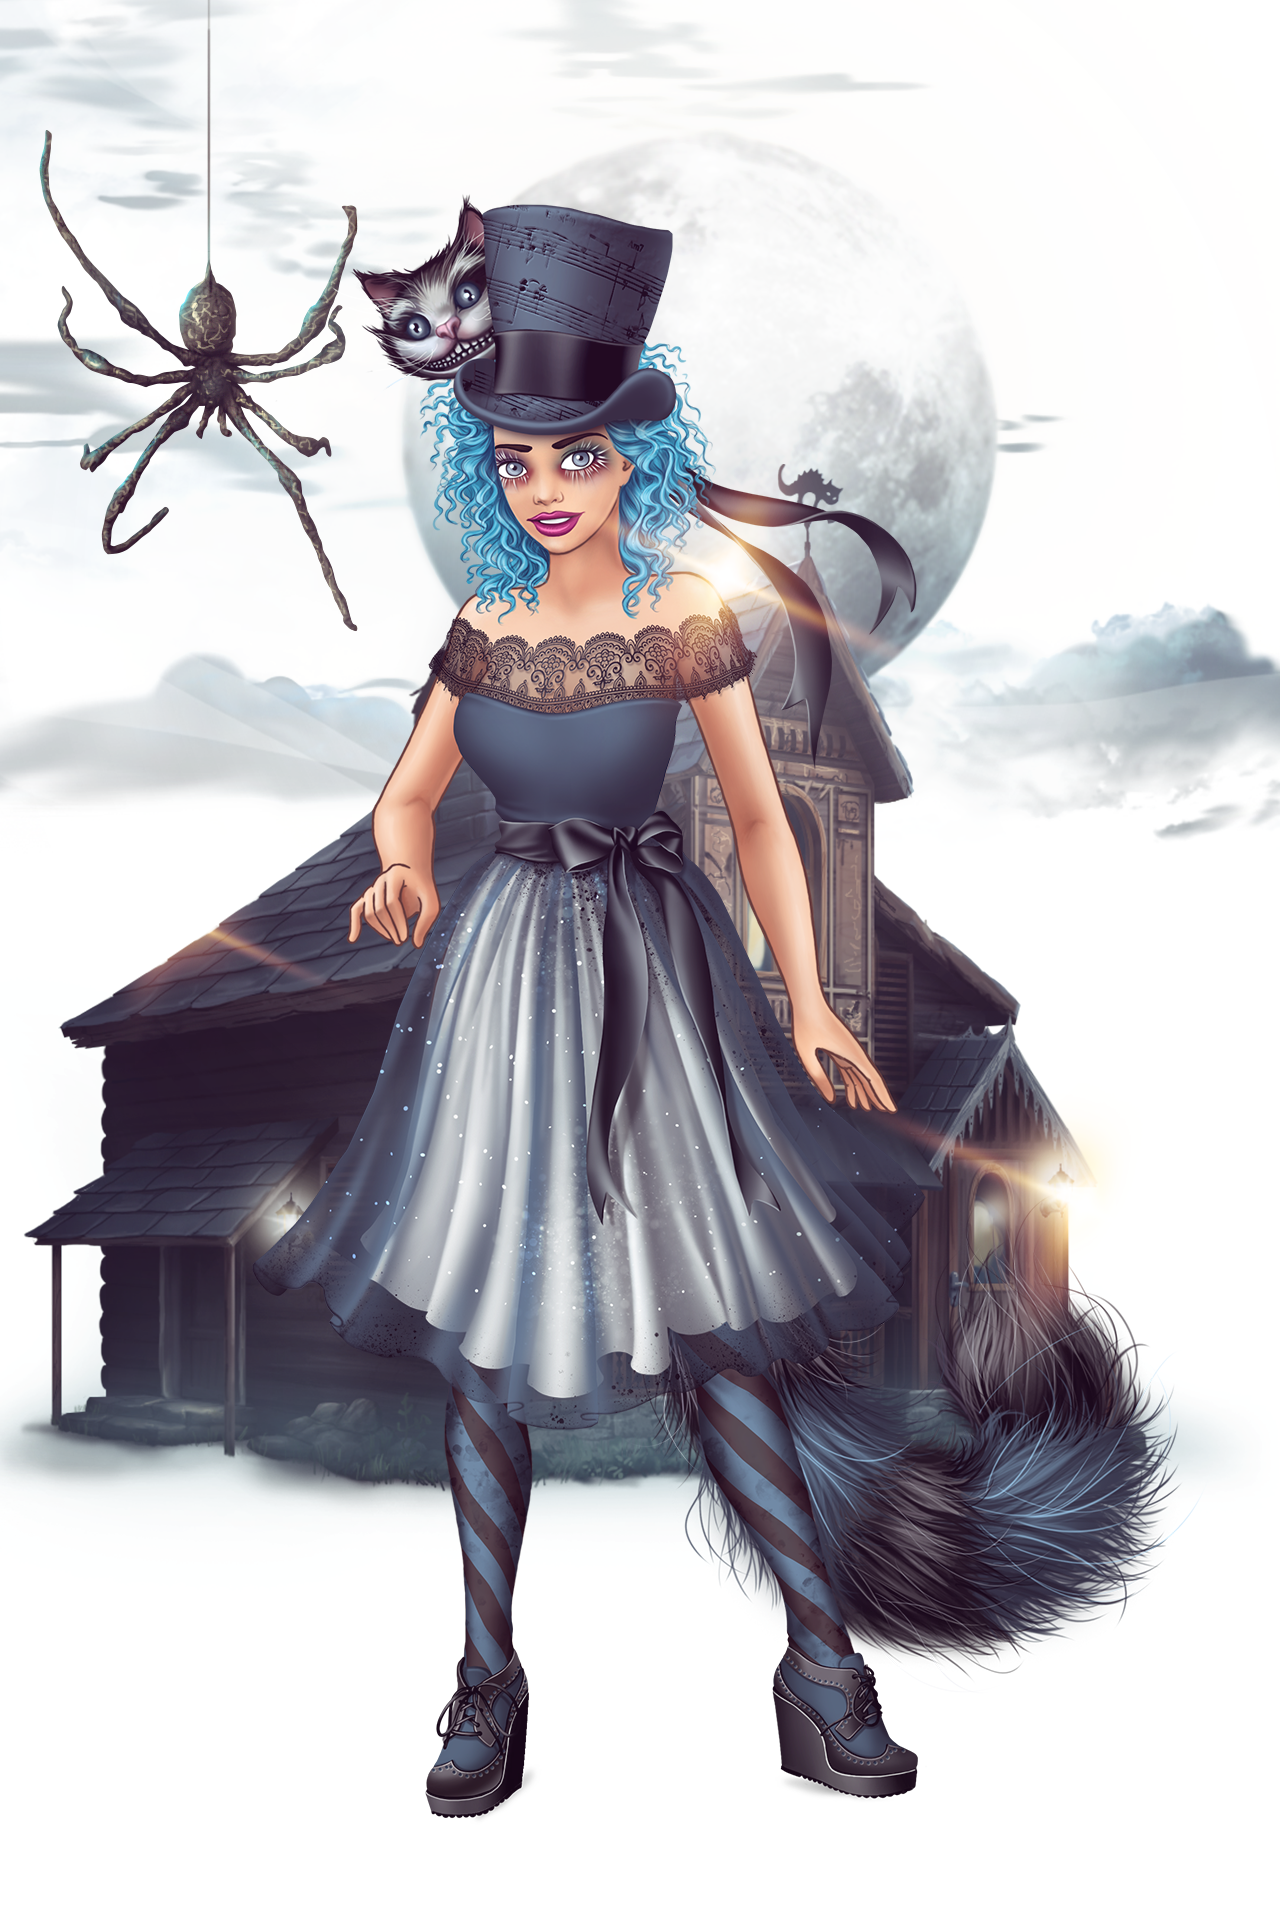 Event Spooky Halloween ladypopular